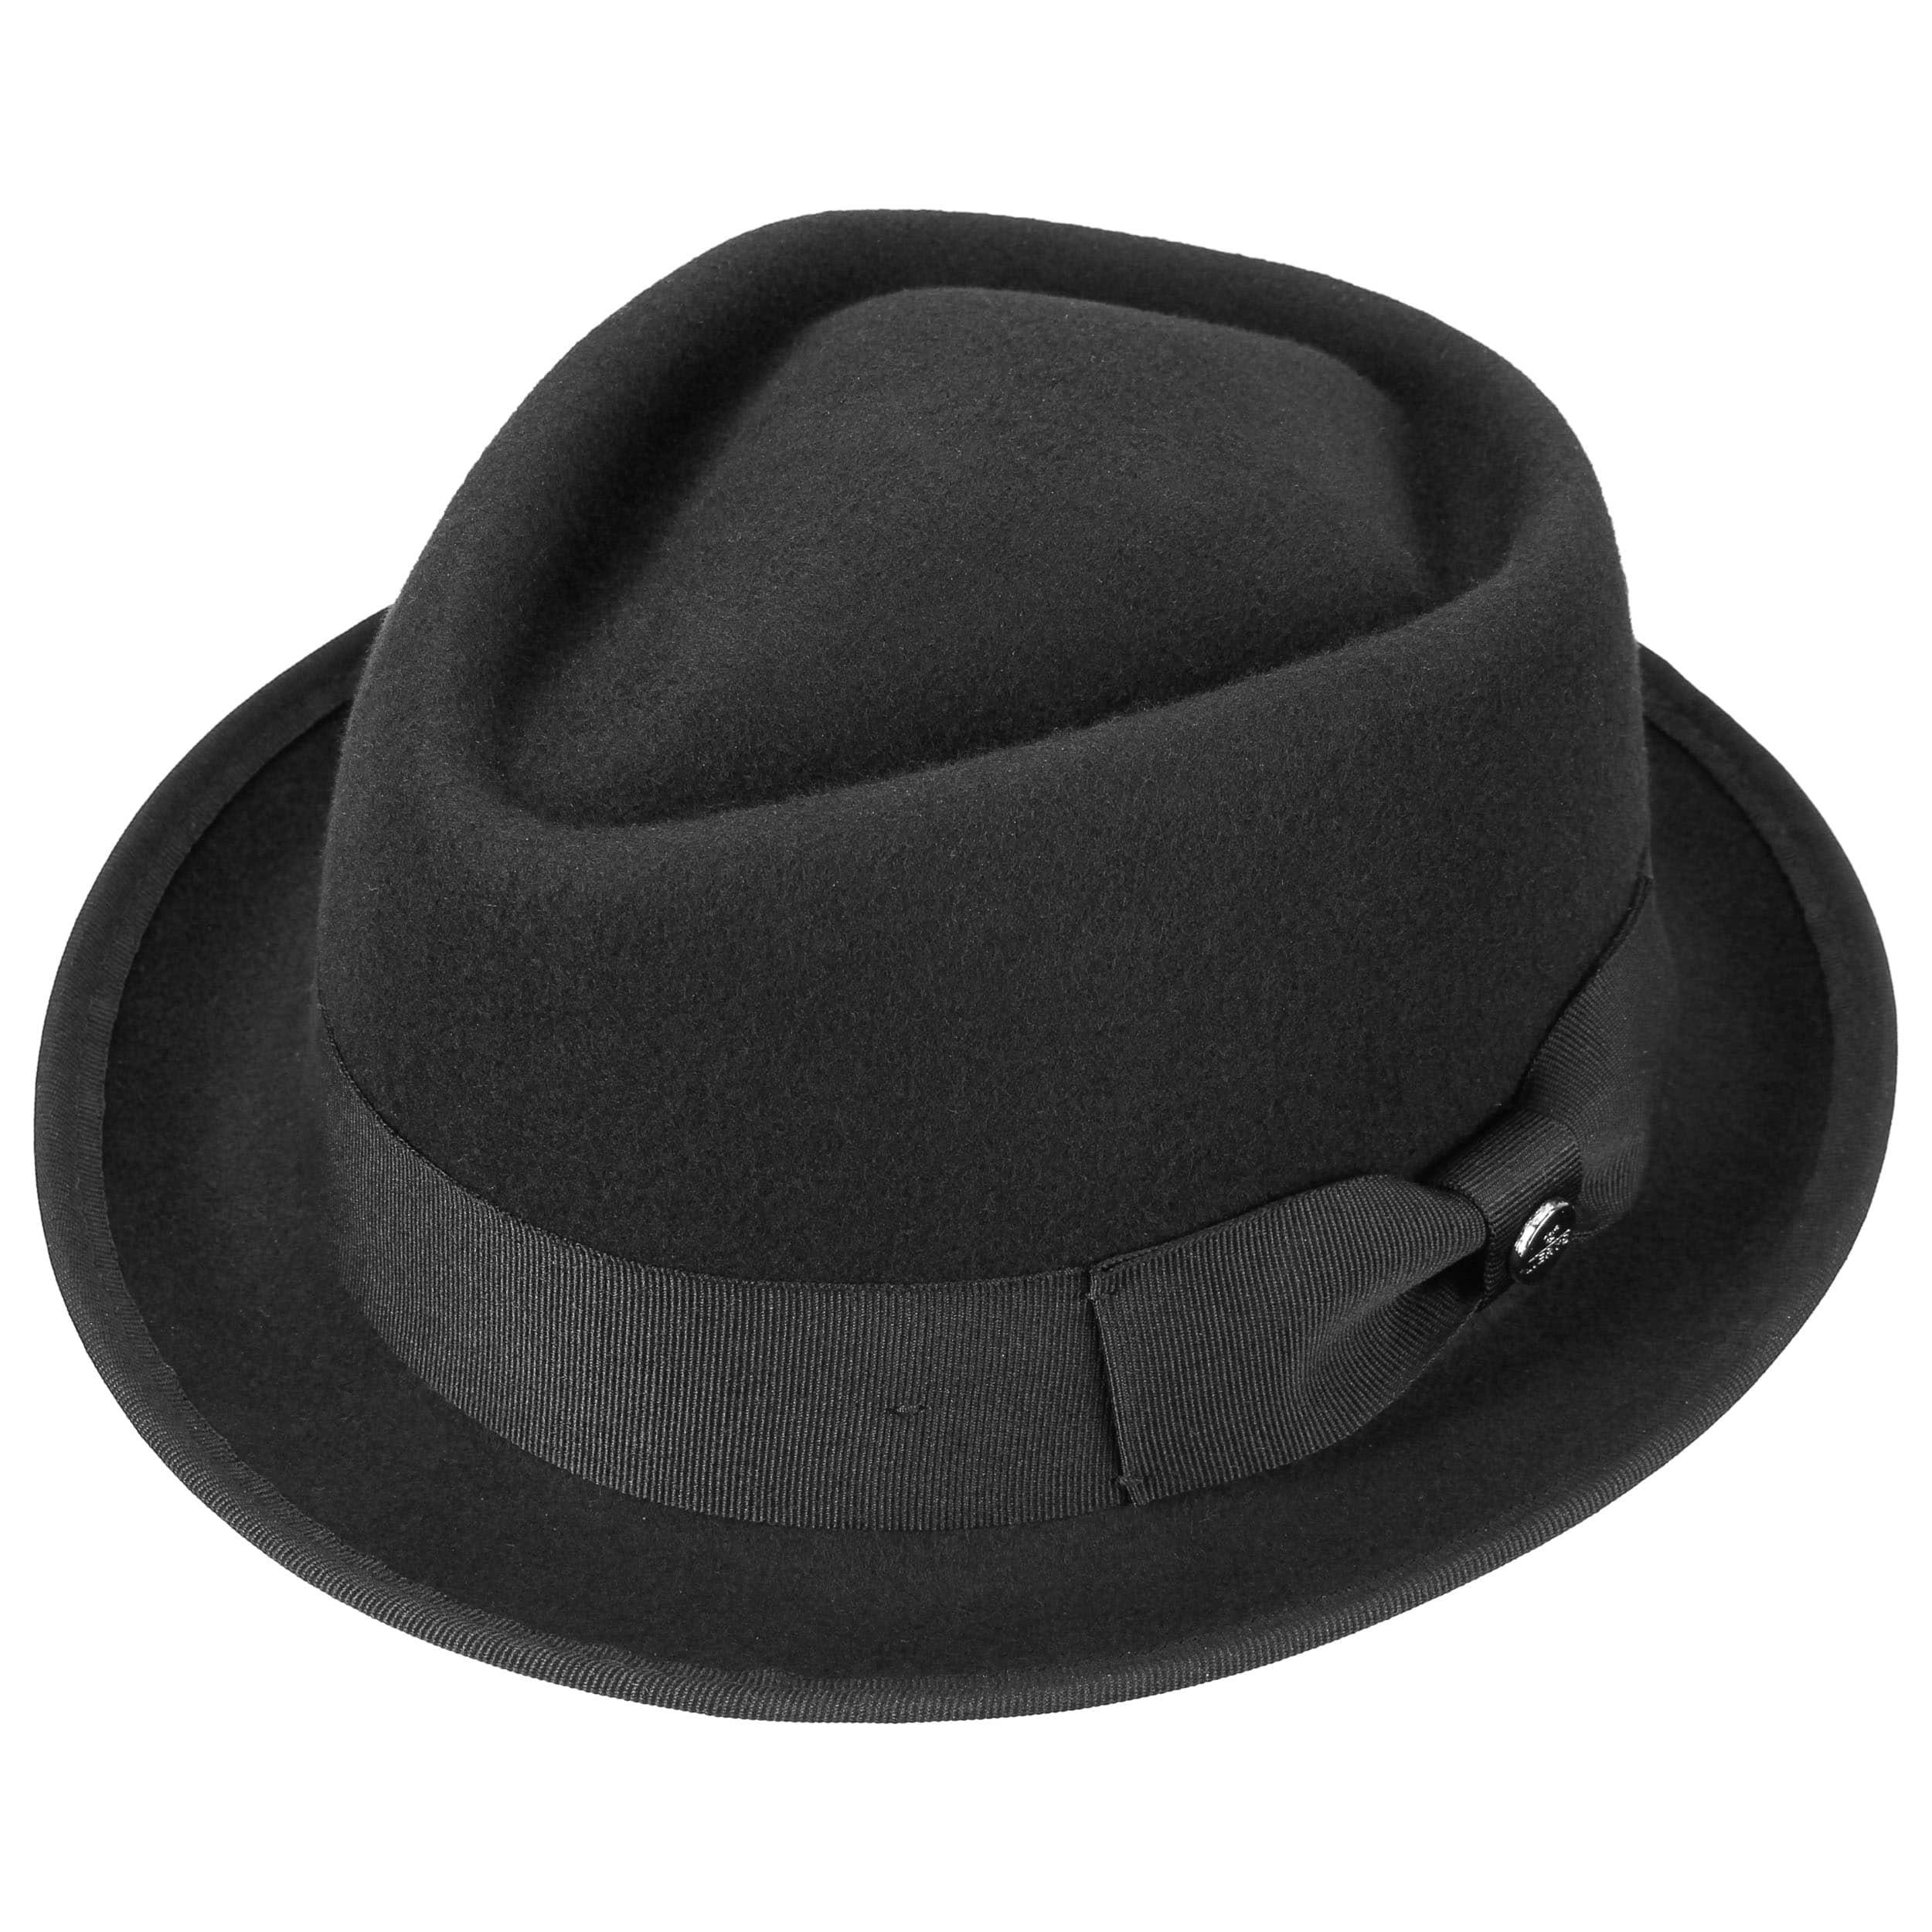 0d8a5944fcba1 ... Fedora Pork Pie Hat by Lierys - black 1 ...